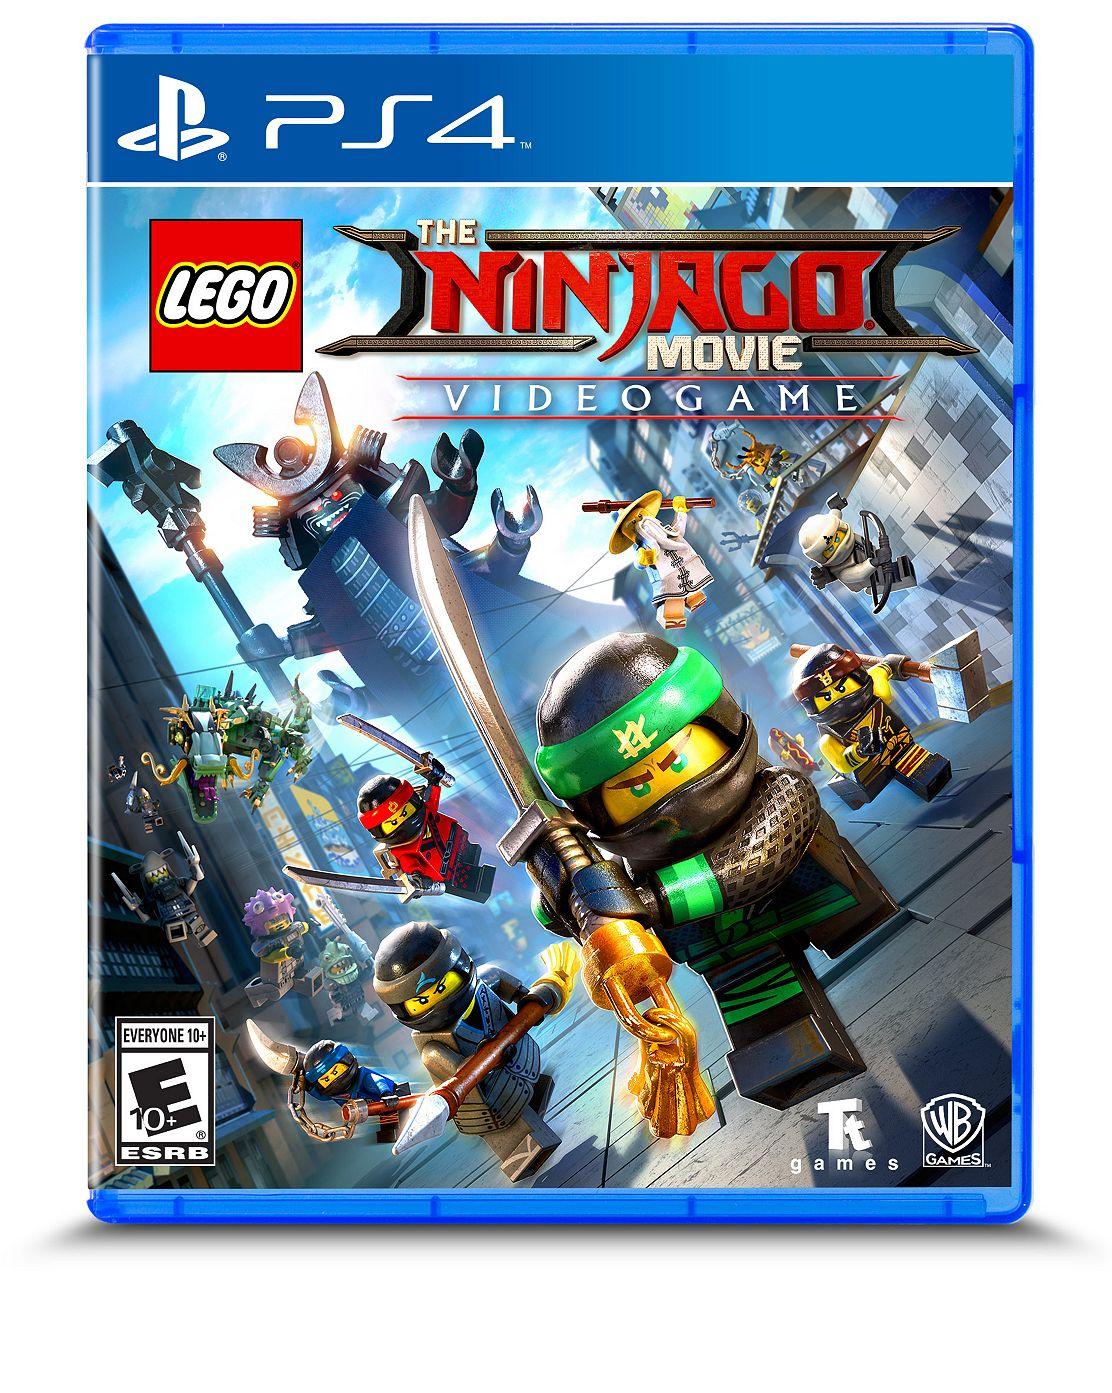 THE LEGO® NINJAGO® MOVIE™ Video Game - PlayStation® 4 5005435 | NINJAGO® |  Buy online at the Official LEGO® Shop US